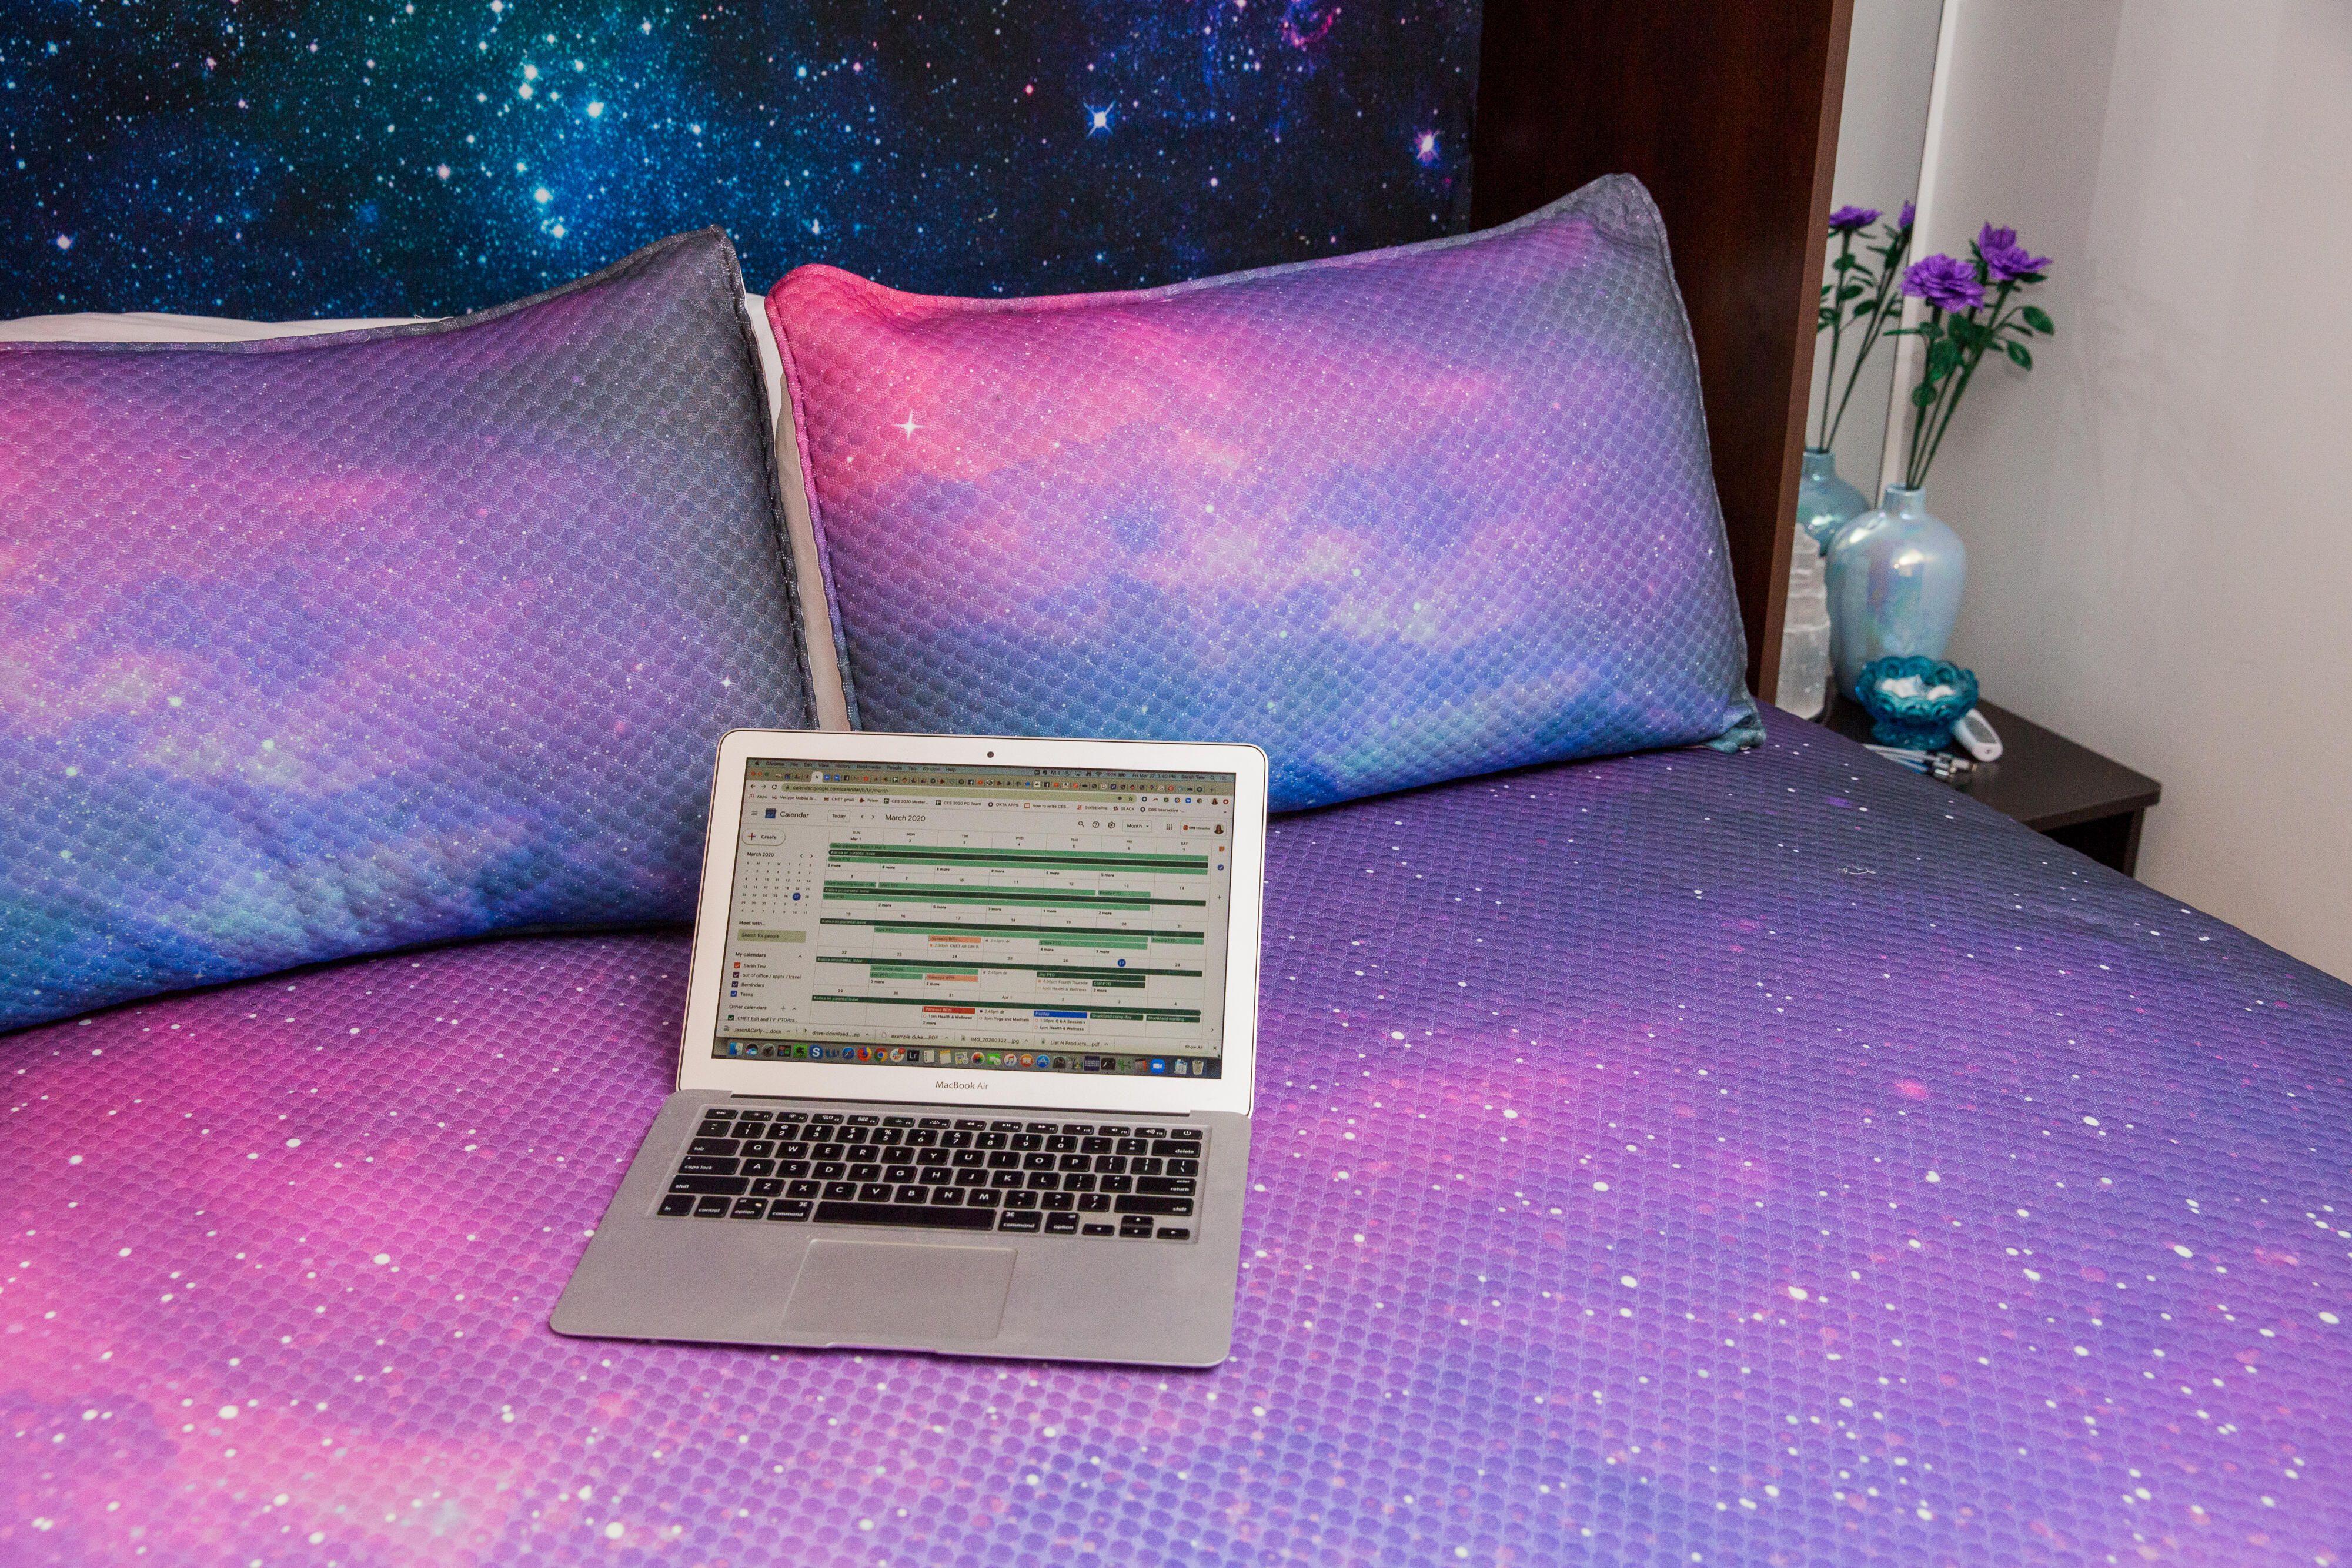 09-work-from-home-laptop-on-bed-coronavirus